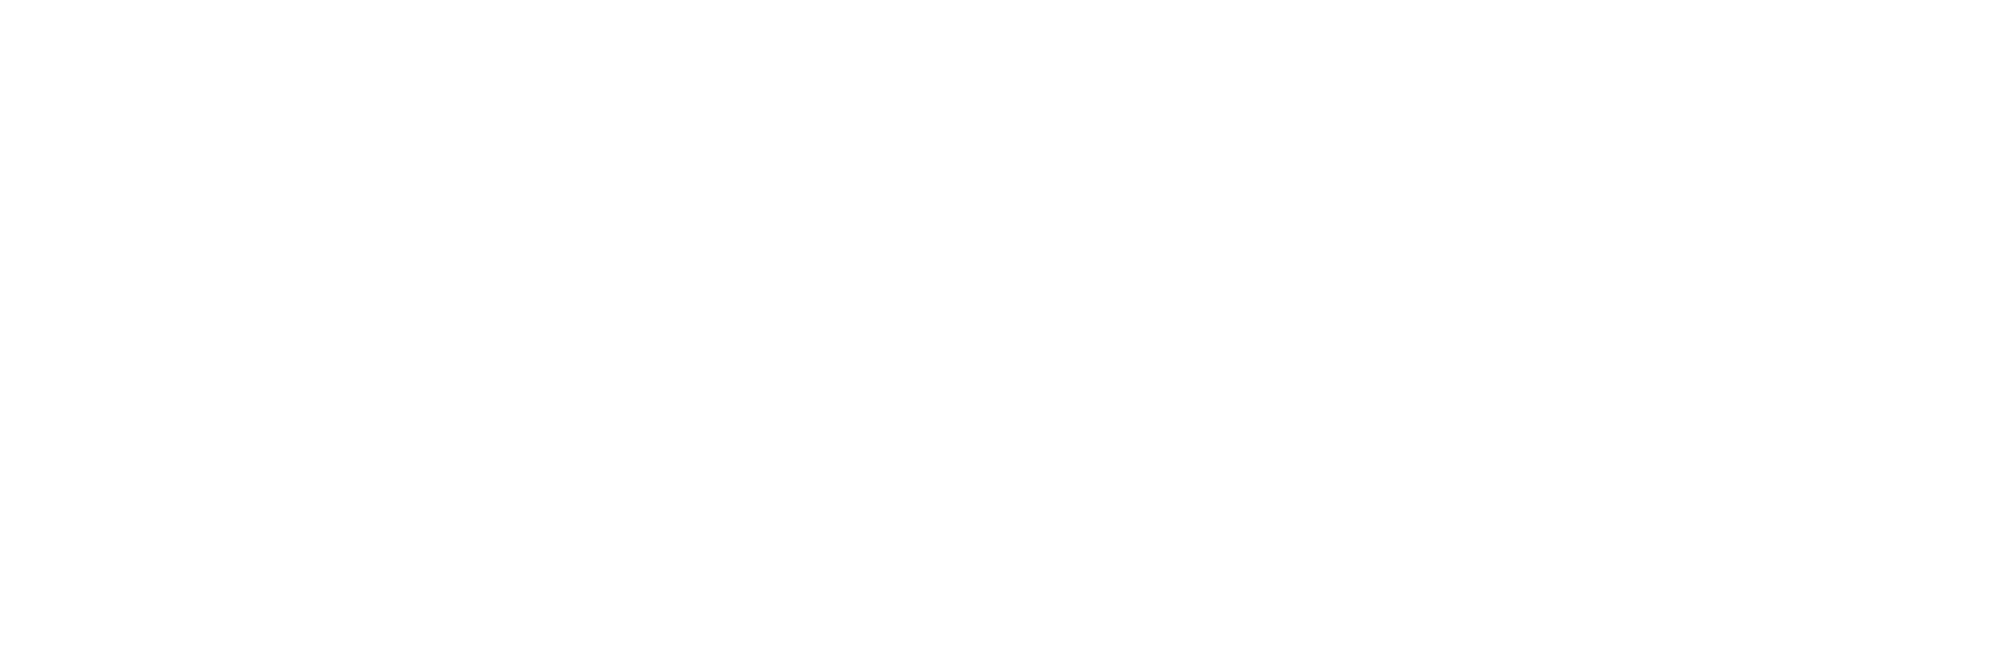 LAMMA 2022 Logo